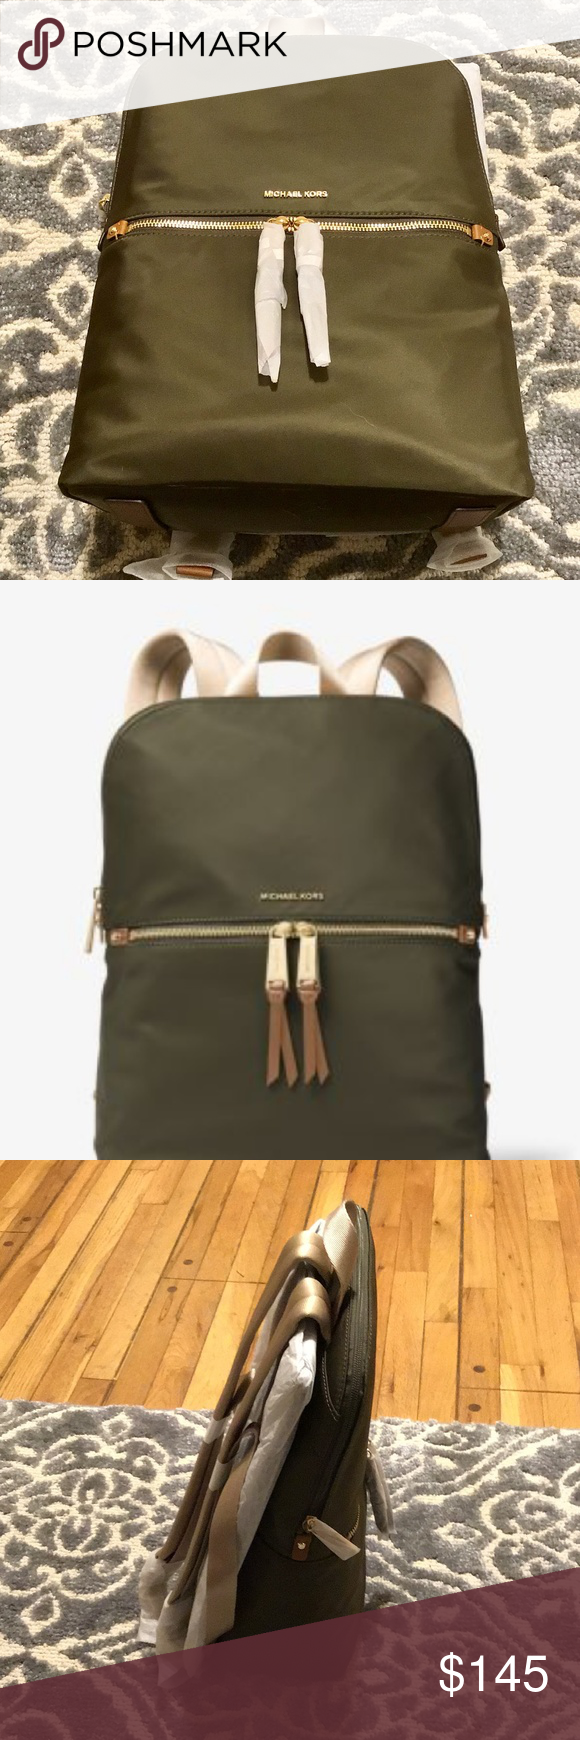 32b21ed2d532 MICHAEL KORS Polly Medium Nylon Backpack NEW WITH TAGS MICHAEL MICHAEL KORS  Polly Medium Nylon Backpack COLOR OLIVE Size No Size • 100% Nylon •  Gold-Tone ...